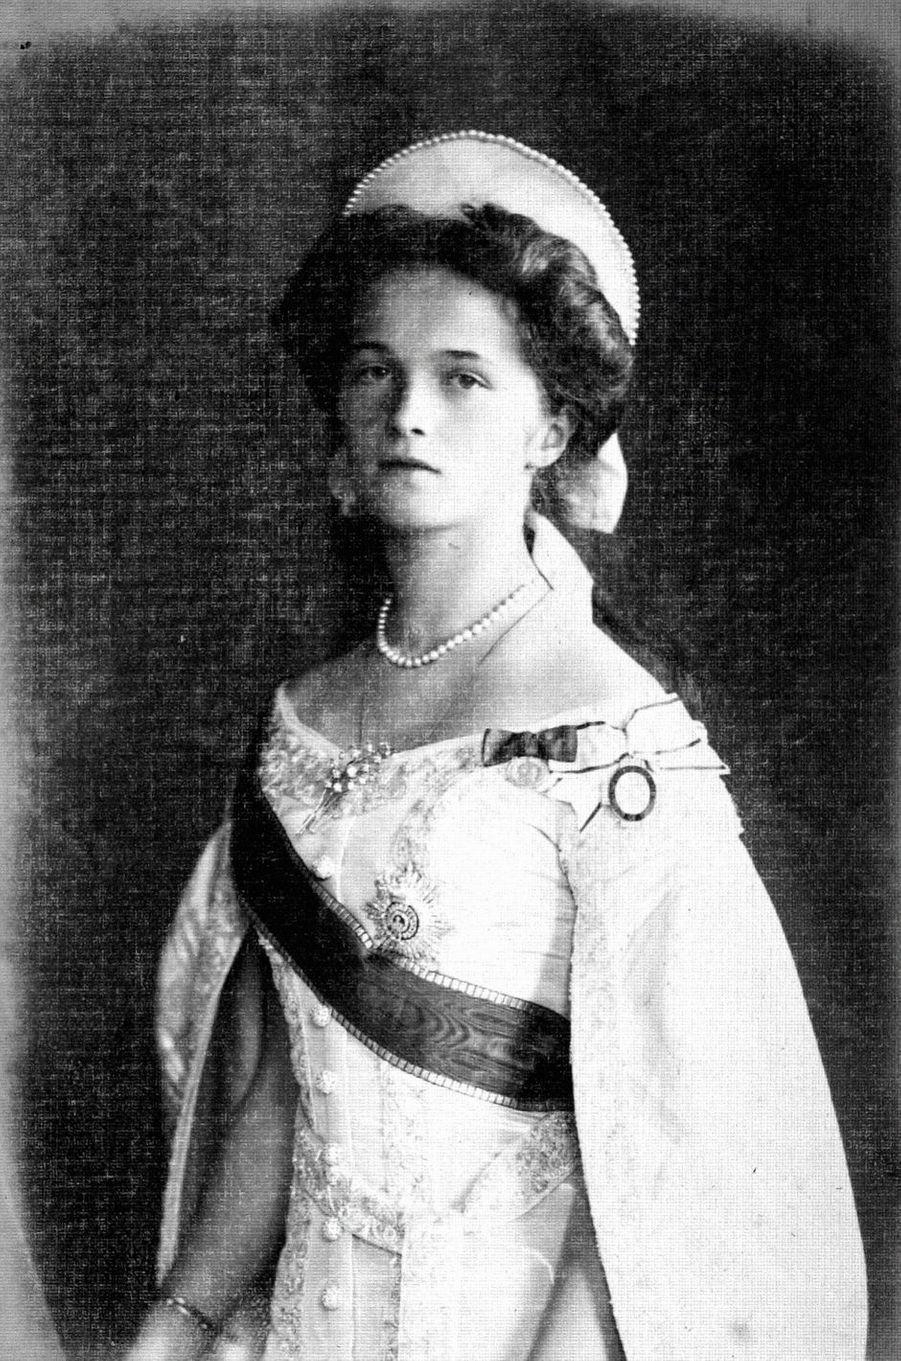 La grande-duchesse Olga de Russie. Photo non datée